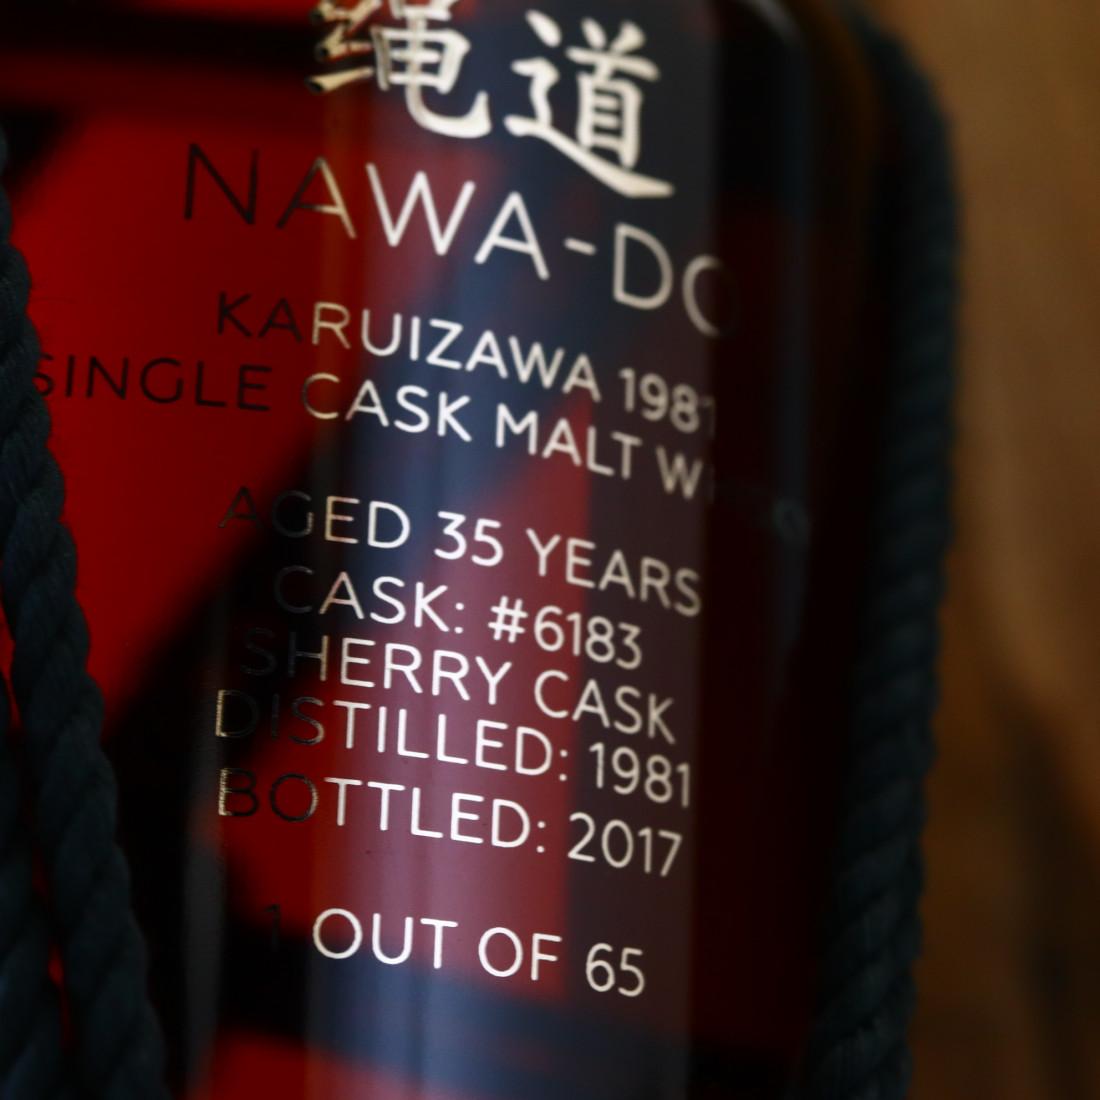 Karuizawa 1981 Wealth Solutions 35 Year Old #6183 / Shibari